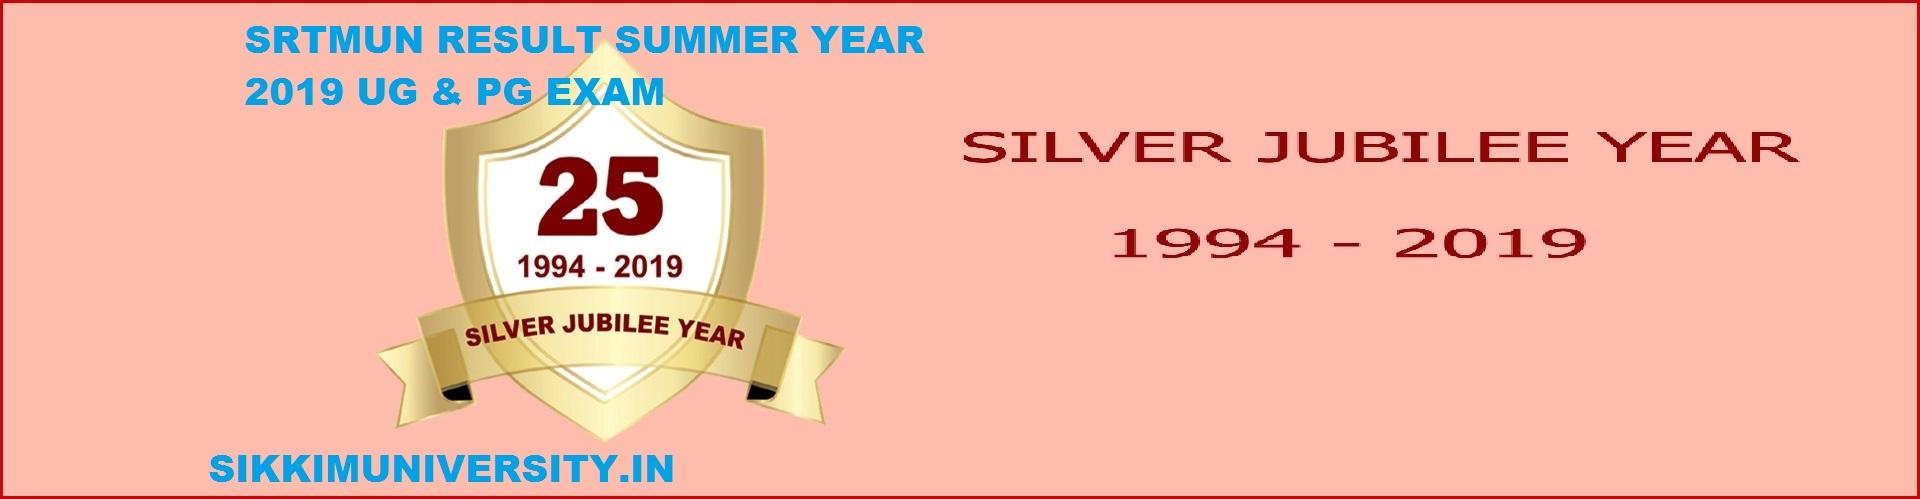 SRTMUN Results Summer 2021, Part 1, 2, 3 Year B.Ed, MA, BCOM, BSC, MCOM, BA, MSC, BSW 1